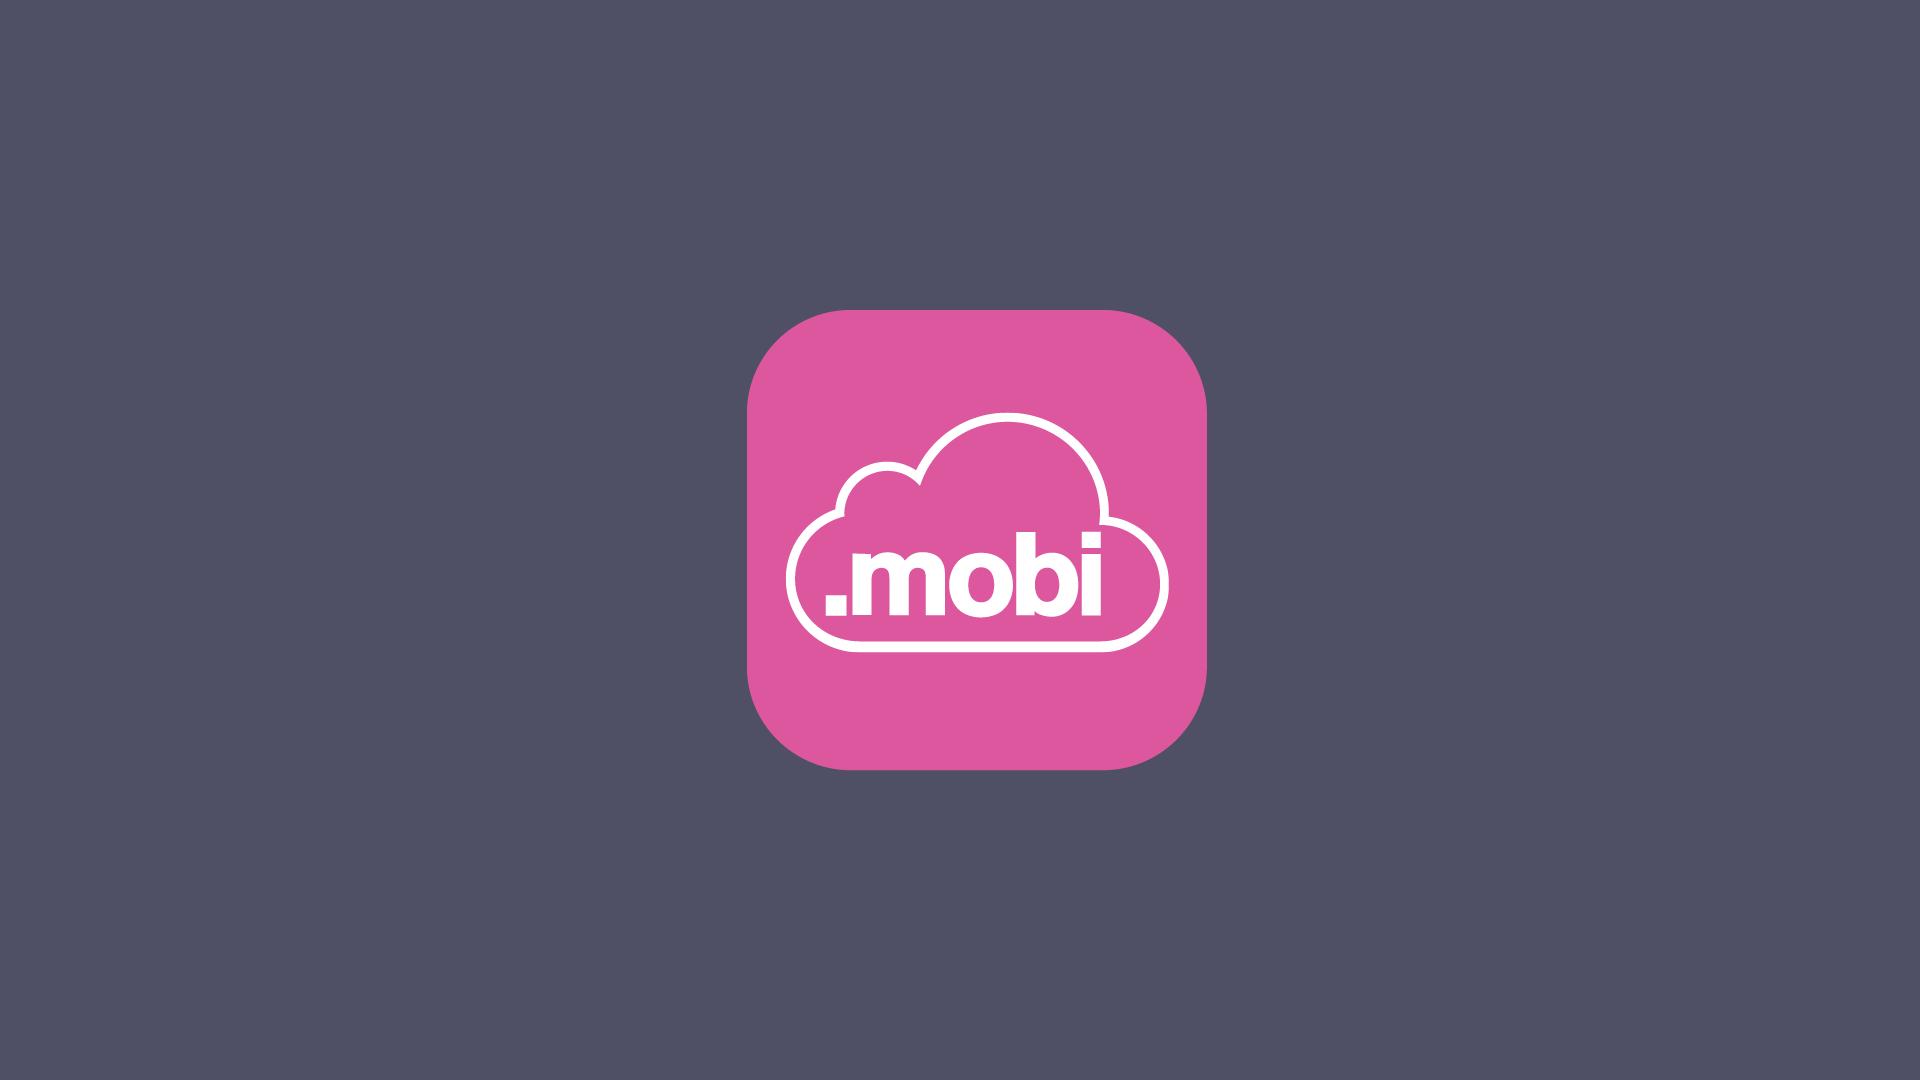 datajar.mobi